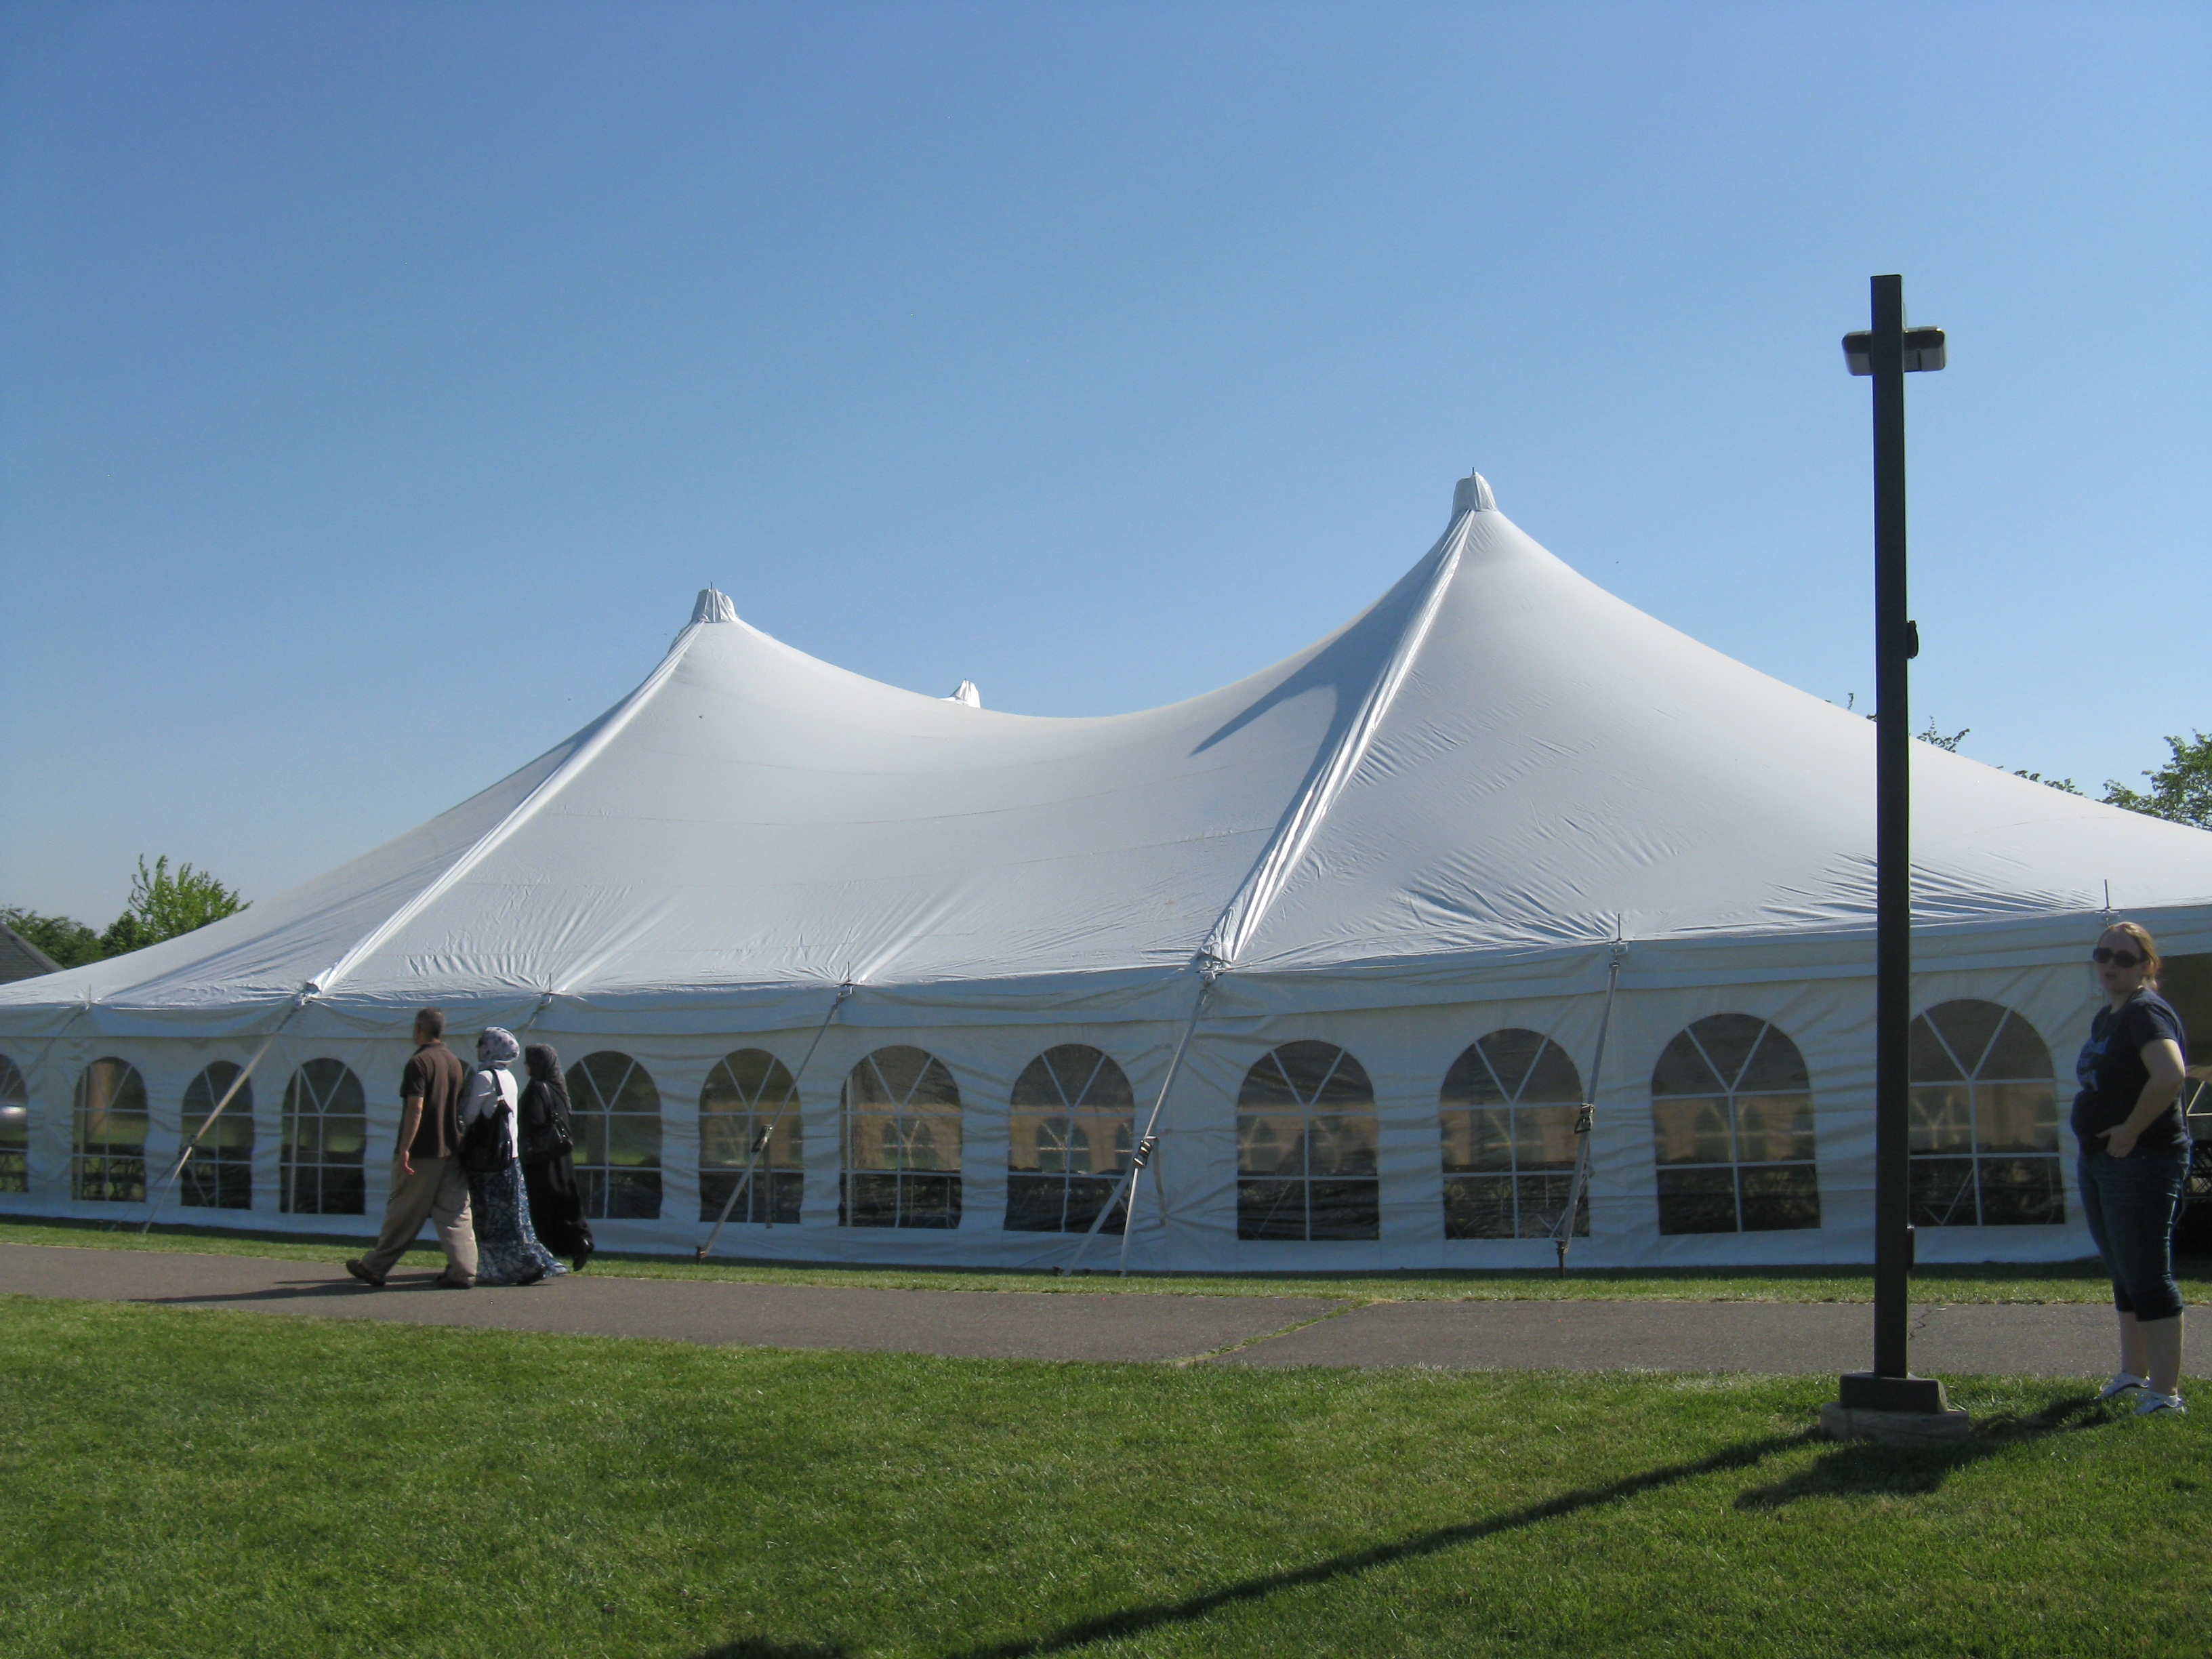 & 60 x 90 Pole Tent